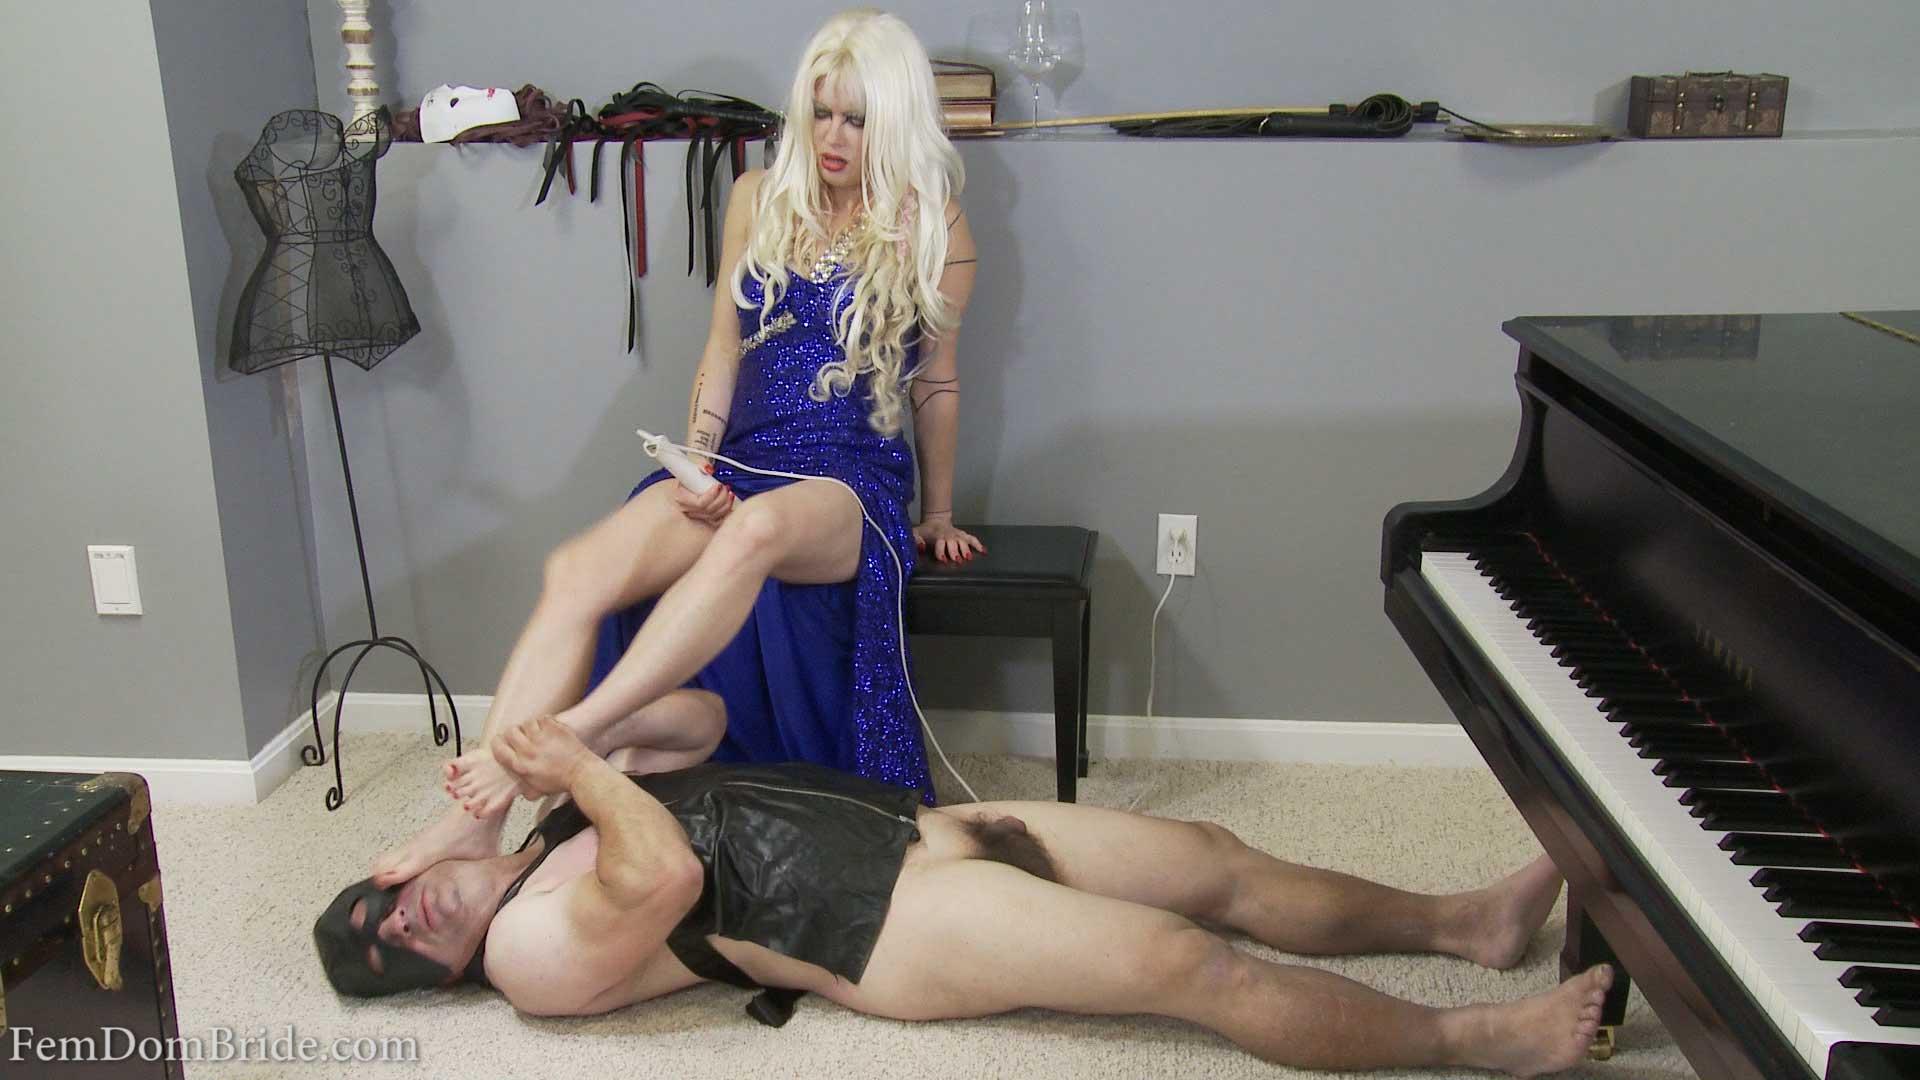 FemDom punishes her slave